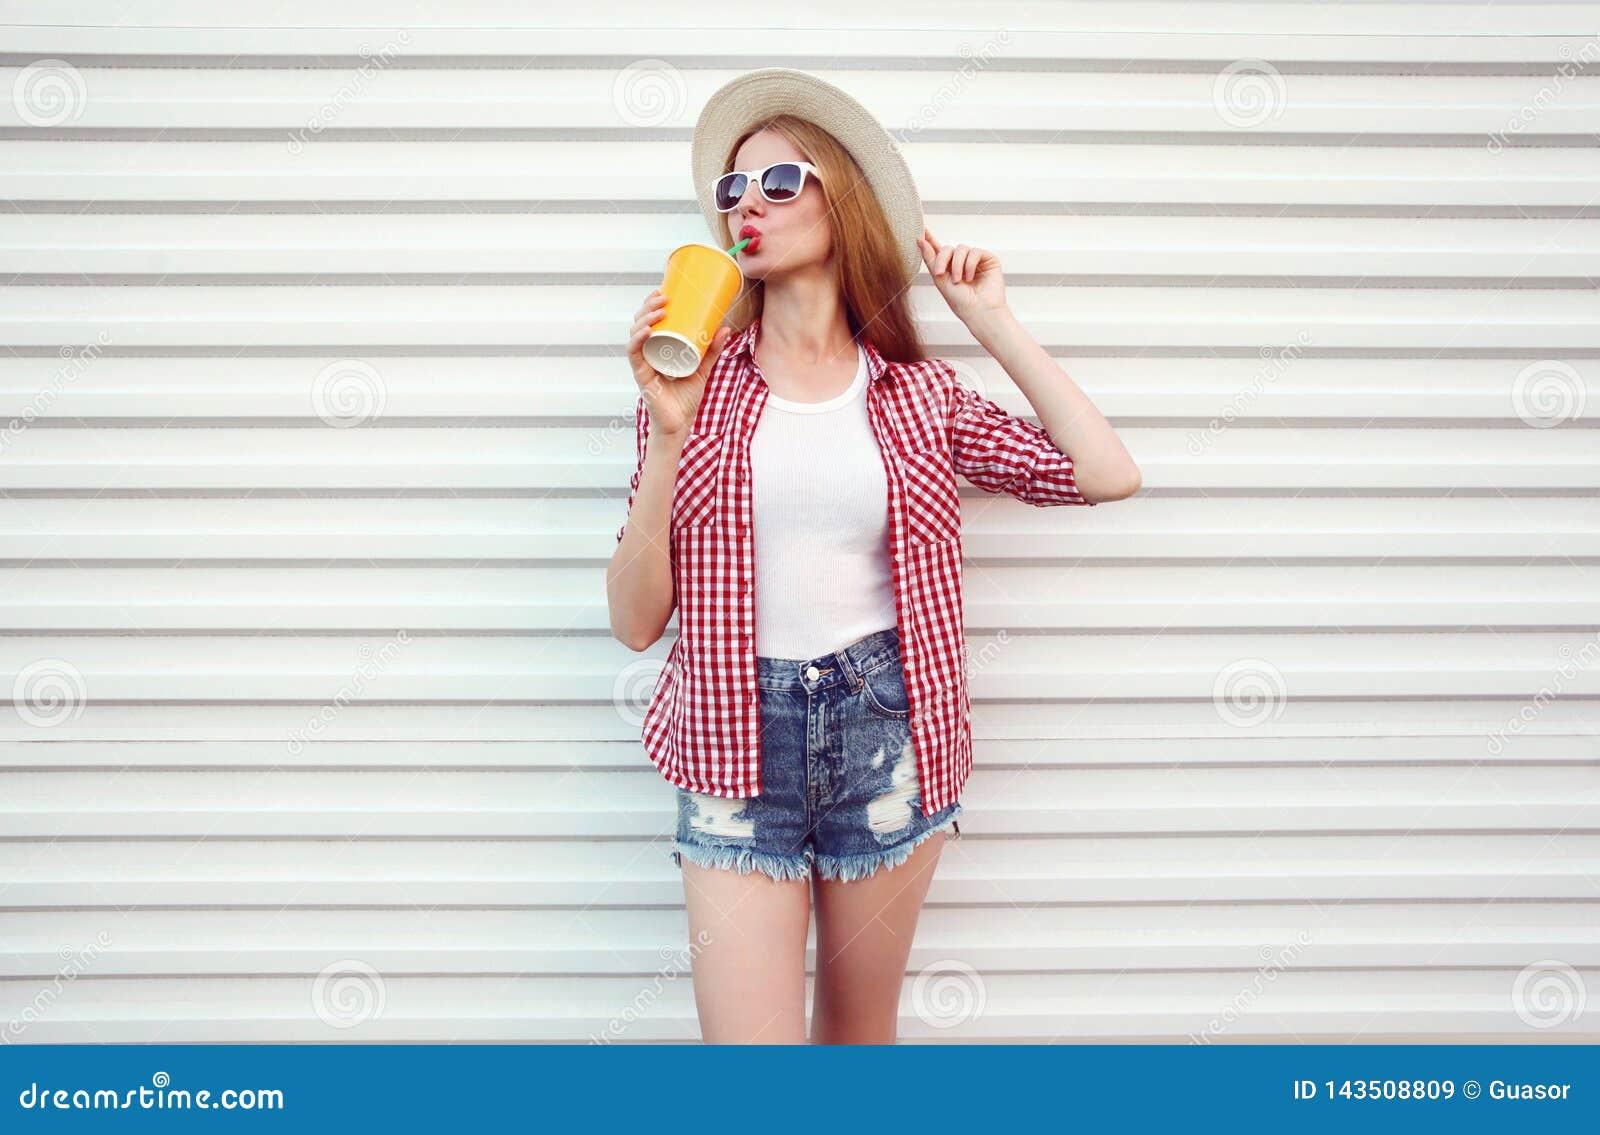 Happy woman enjoying fresh orange juice in summer round straw hat, checkered shirt, shorts on white wall